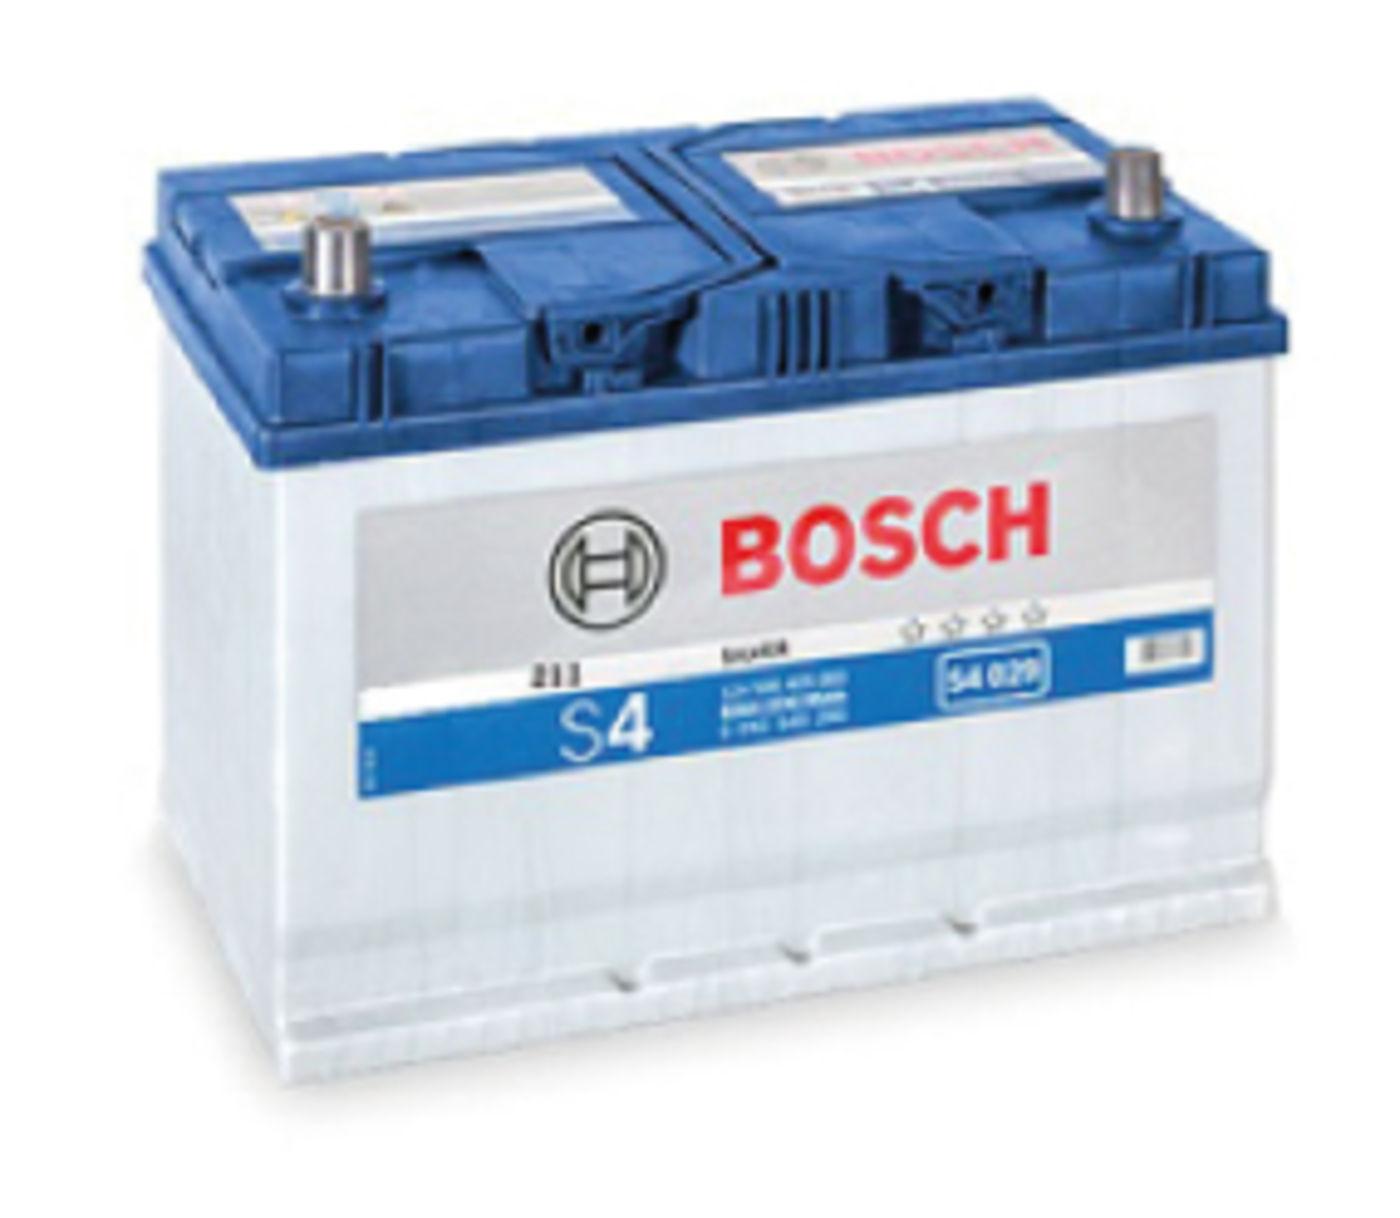 Bosch 66 FE LM